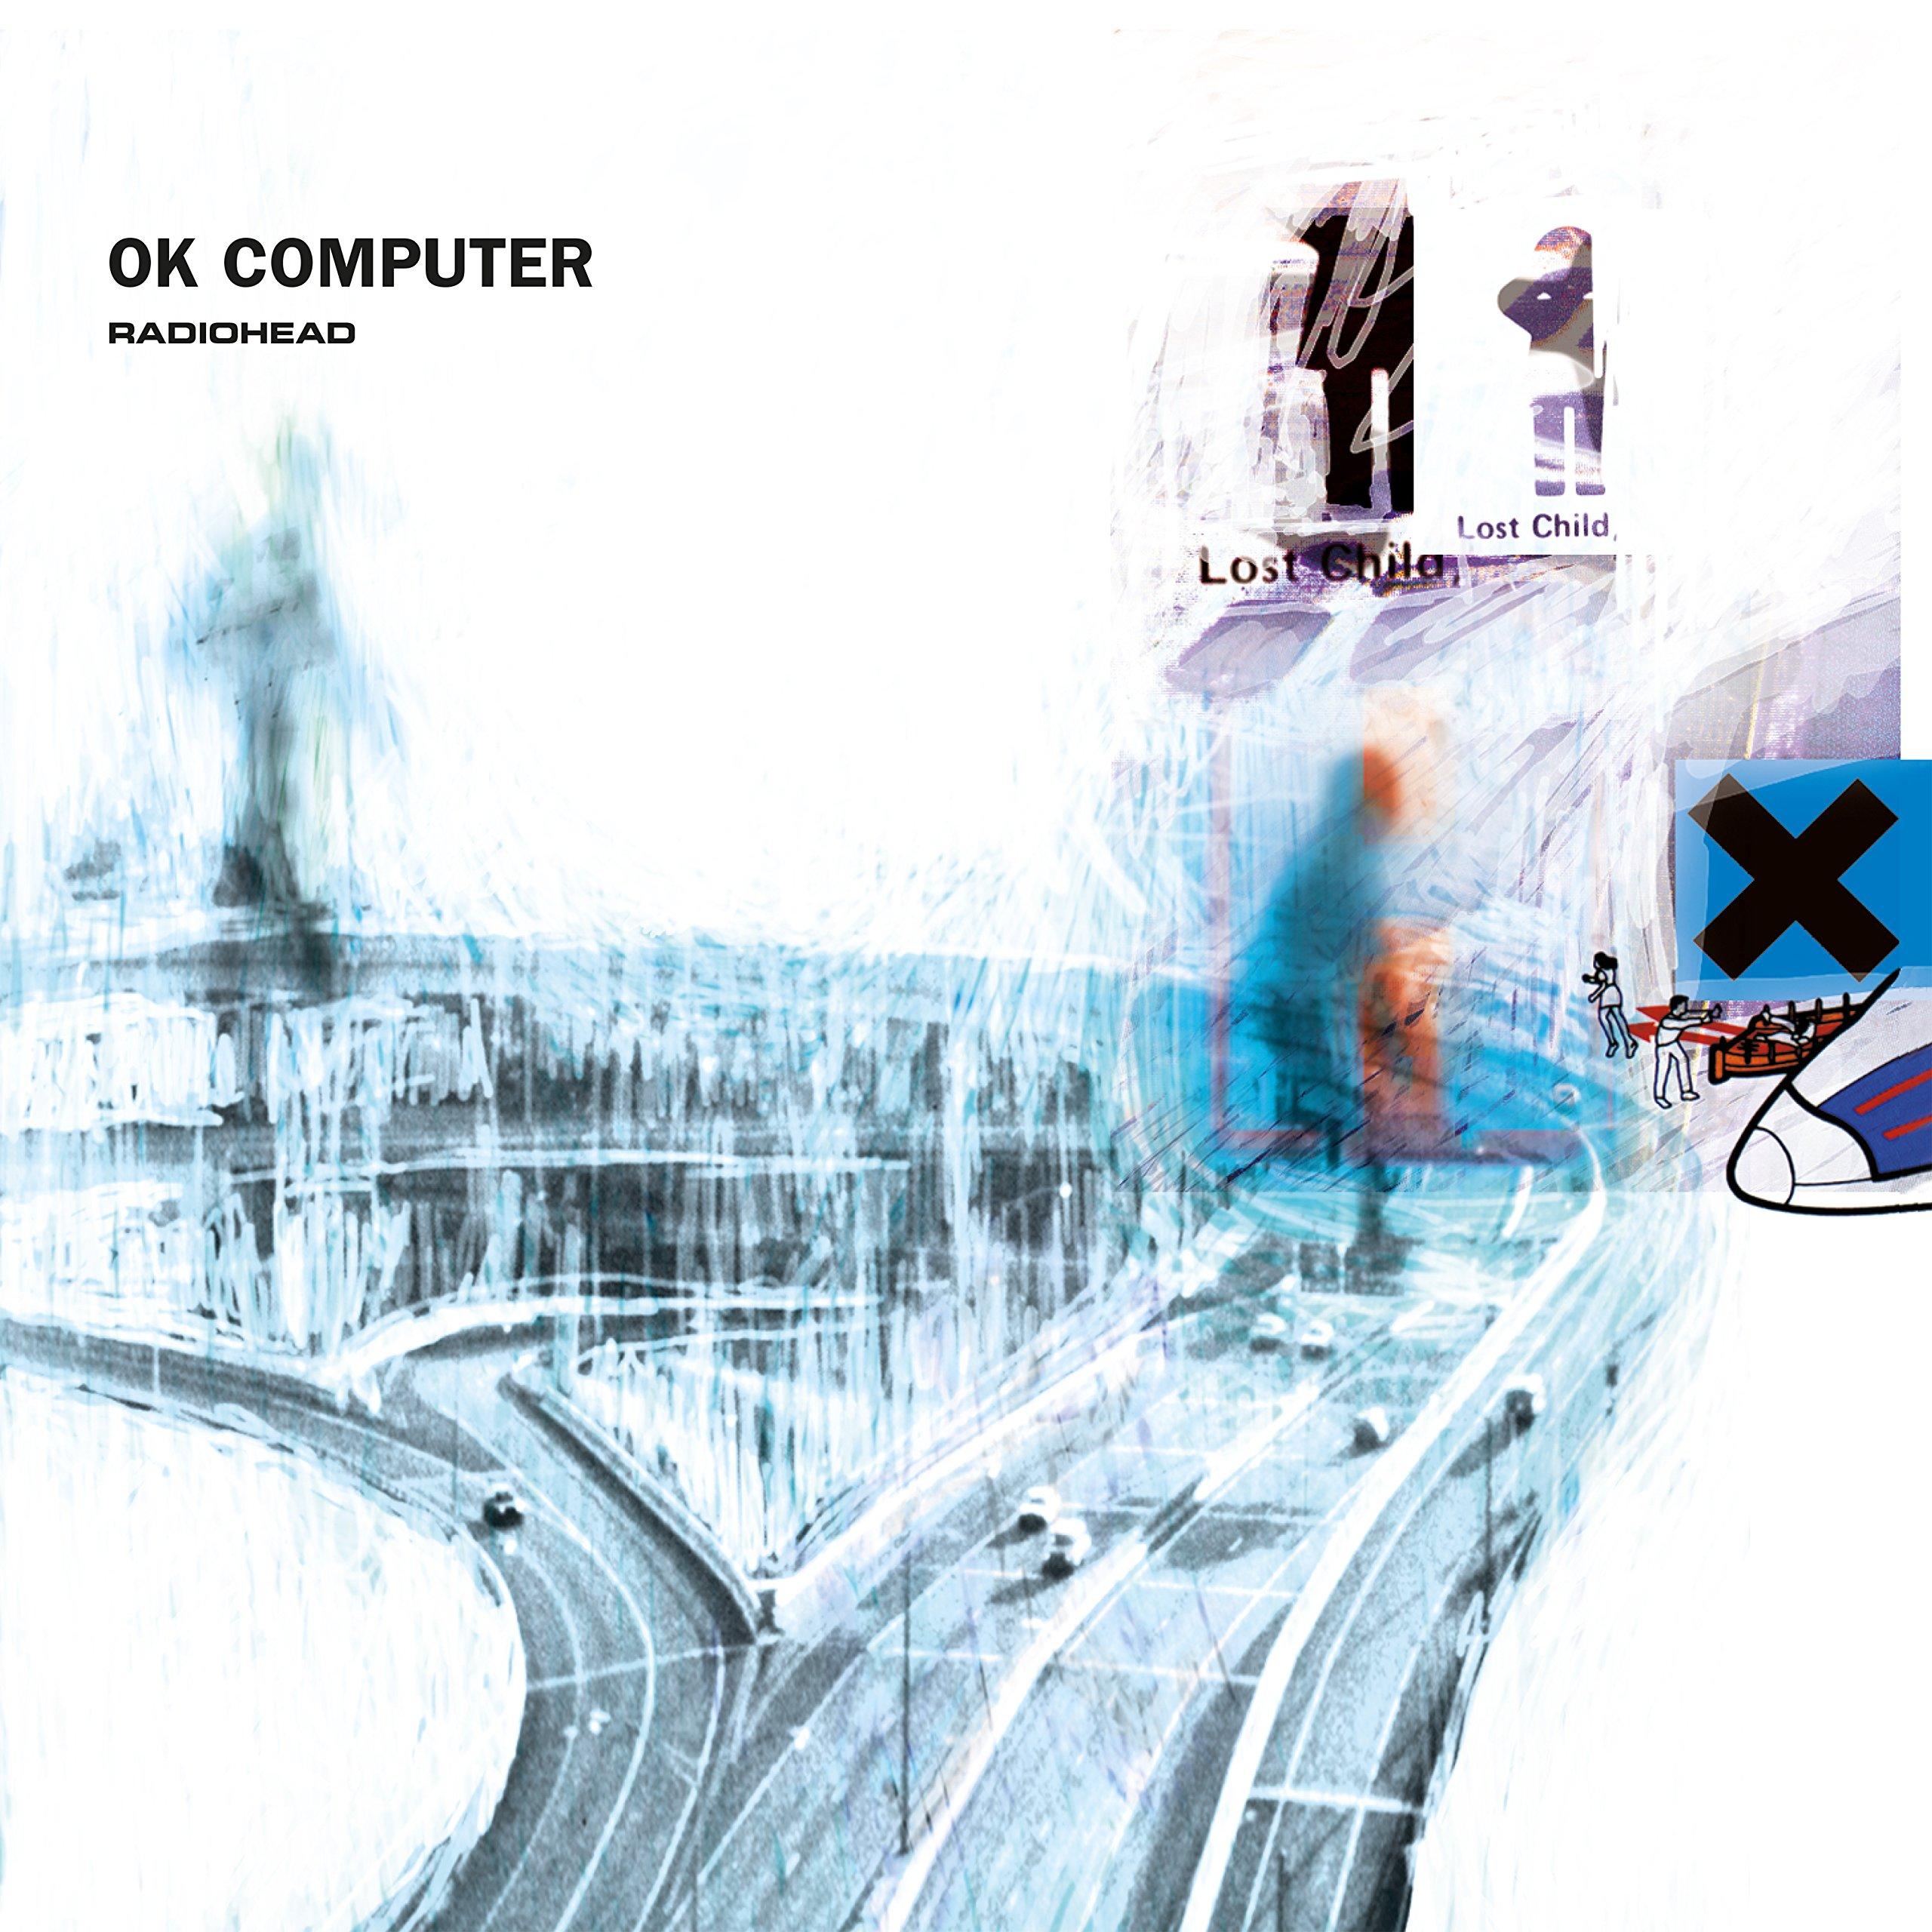 Radiohead-OK Computer-REISSUE-2CD-FLAC-2009-401